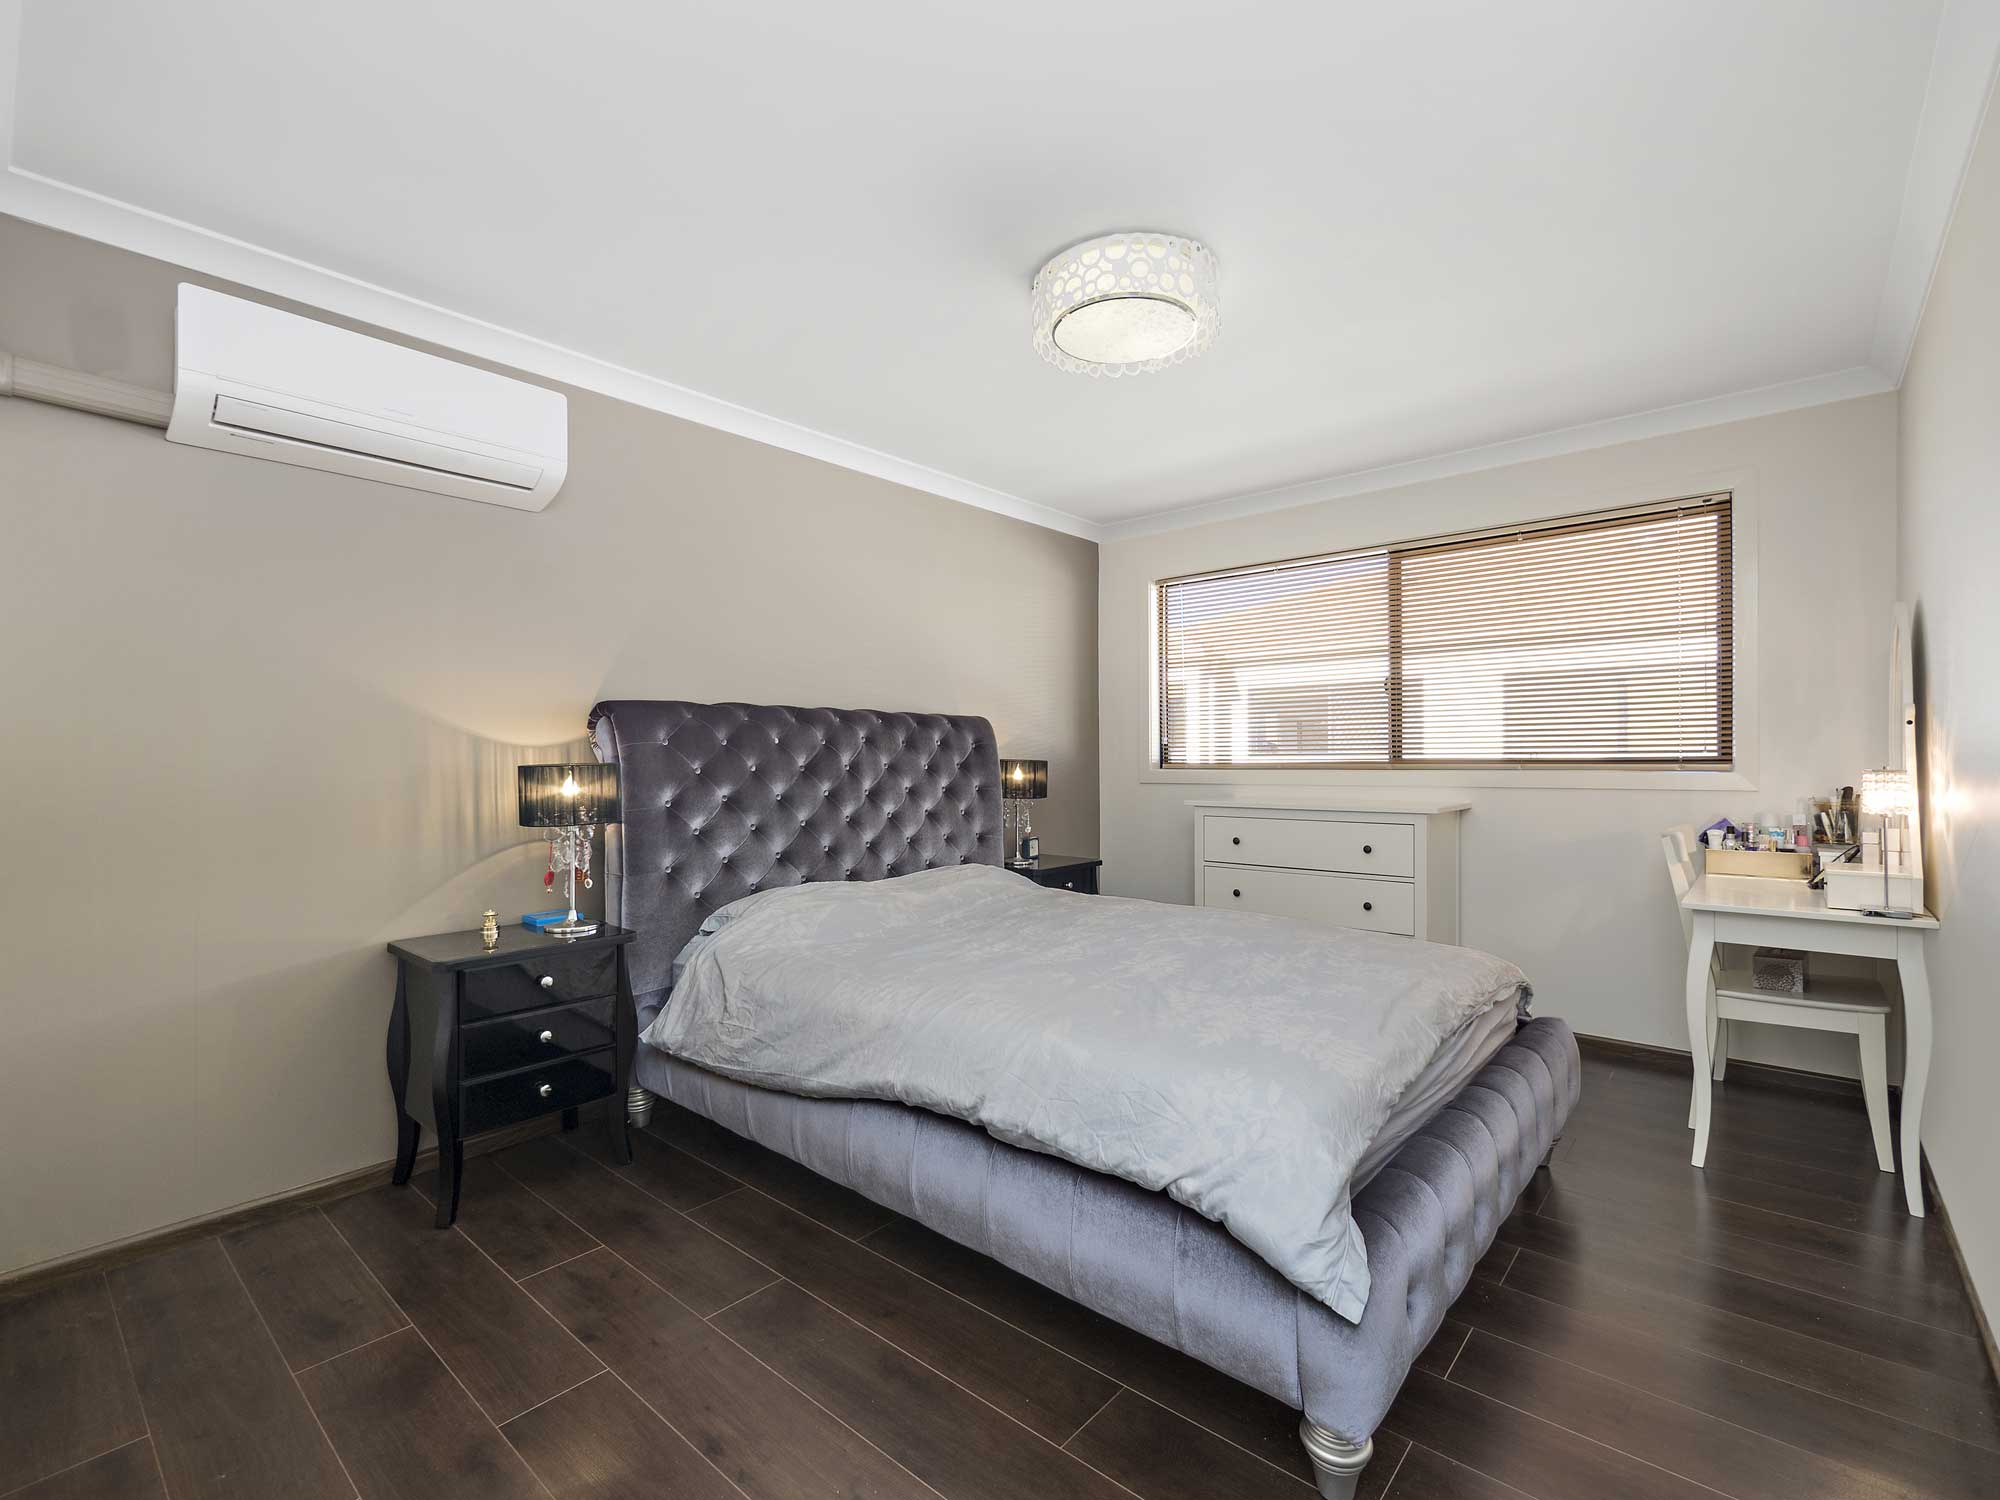 Calamvale master bedroom townhouse photography Brisbane Phil Savory